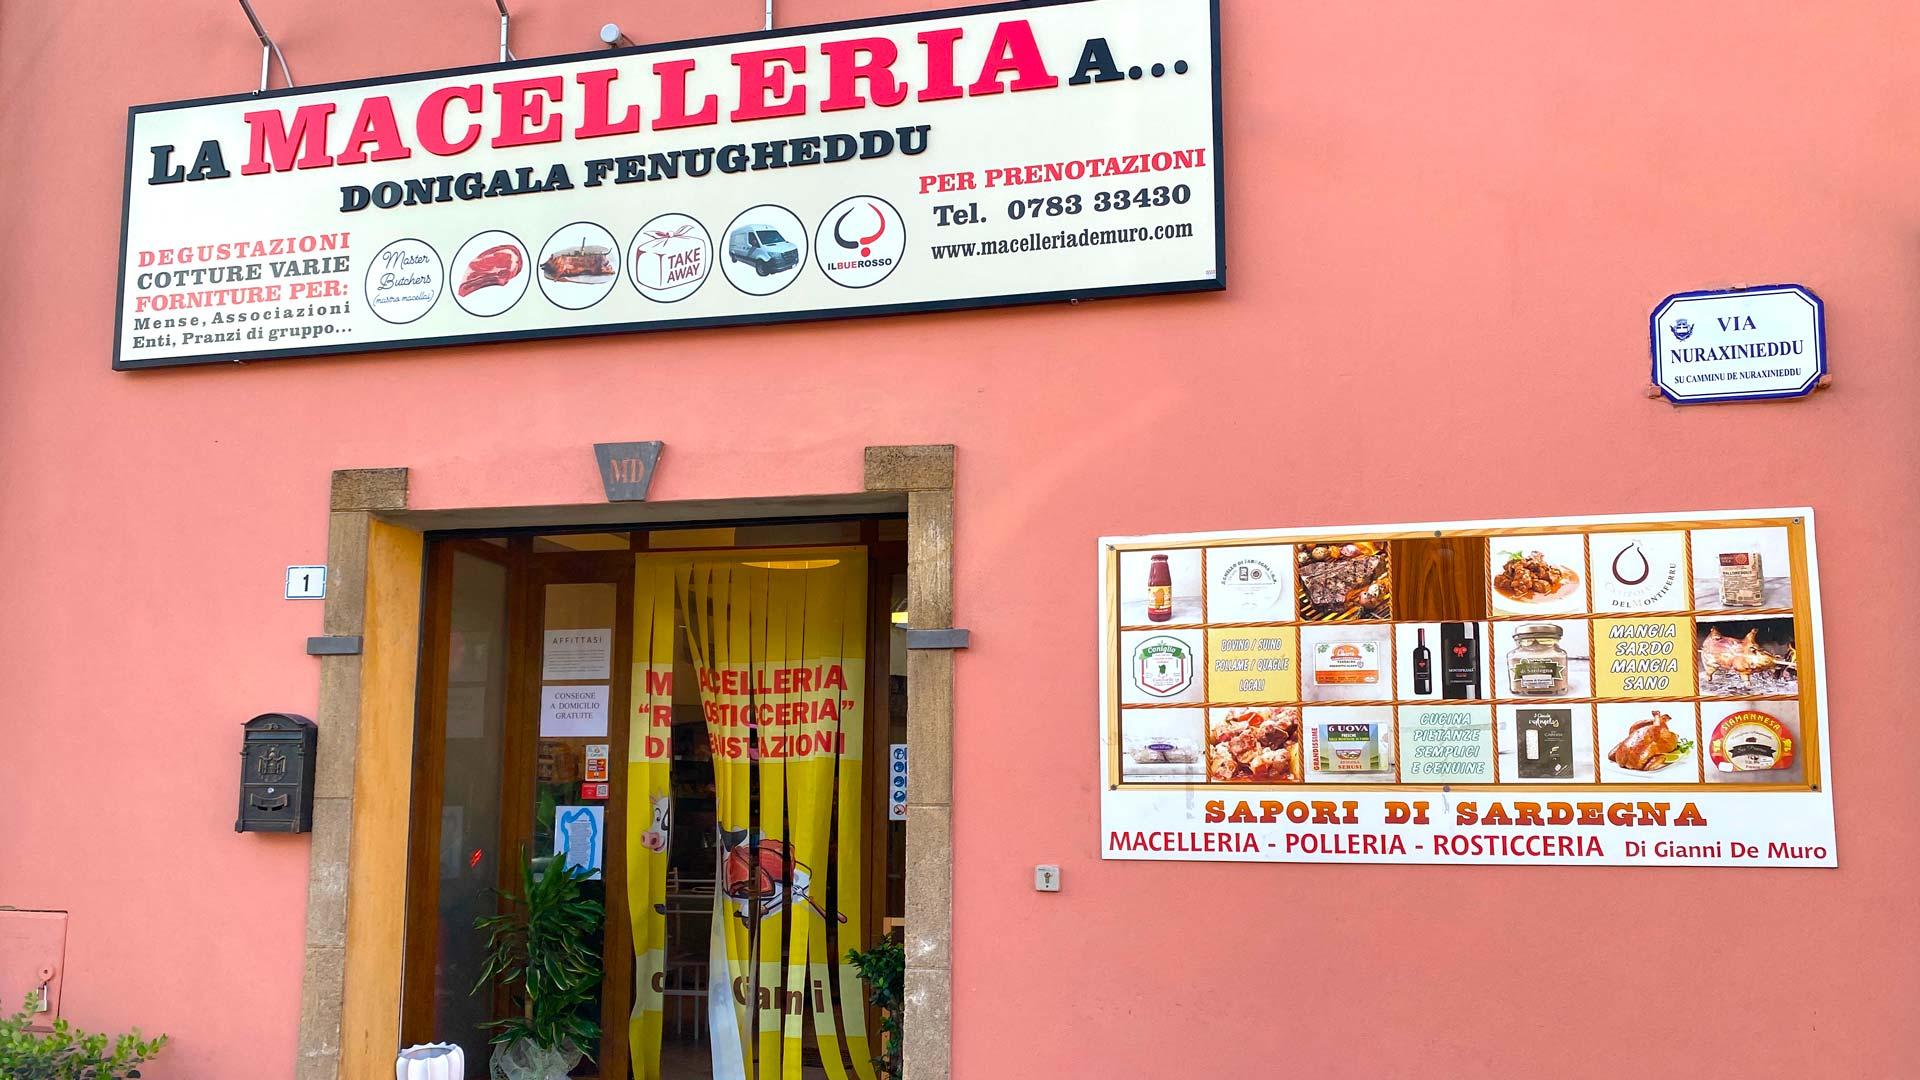 Macelleria da Gianni a Donigala - Oristano